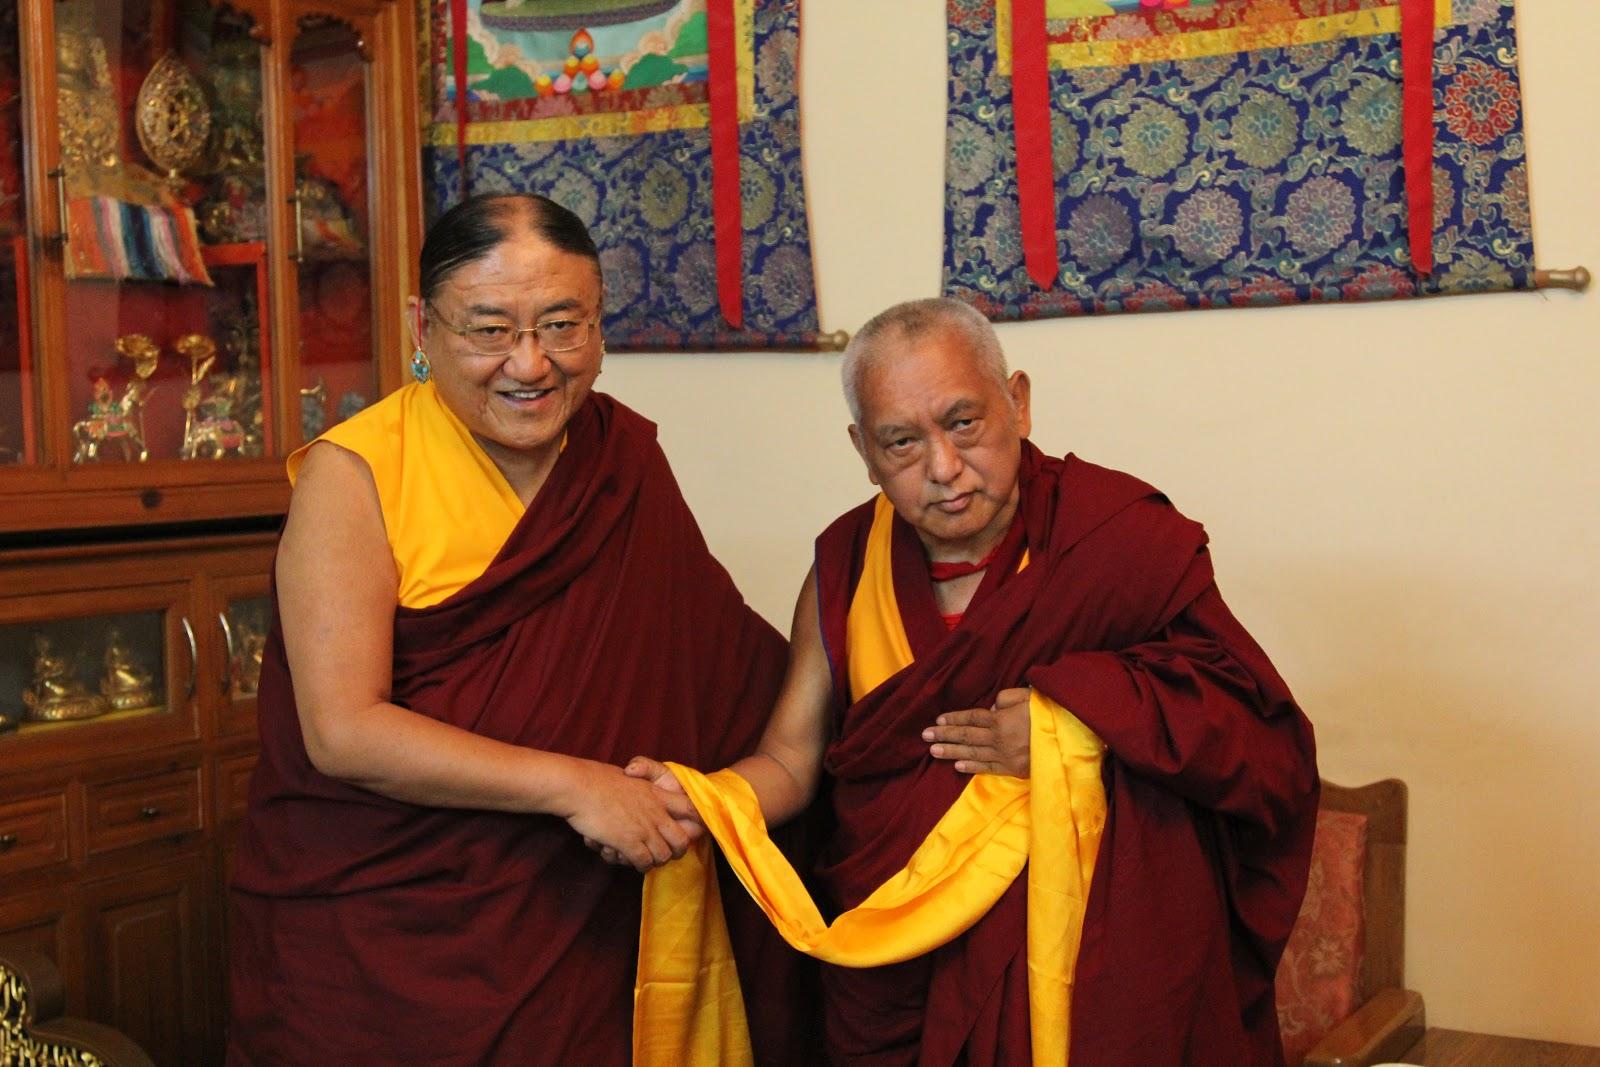 His Holiness Sakya Trizen